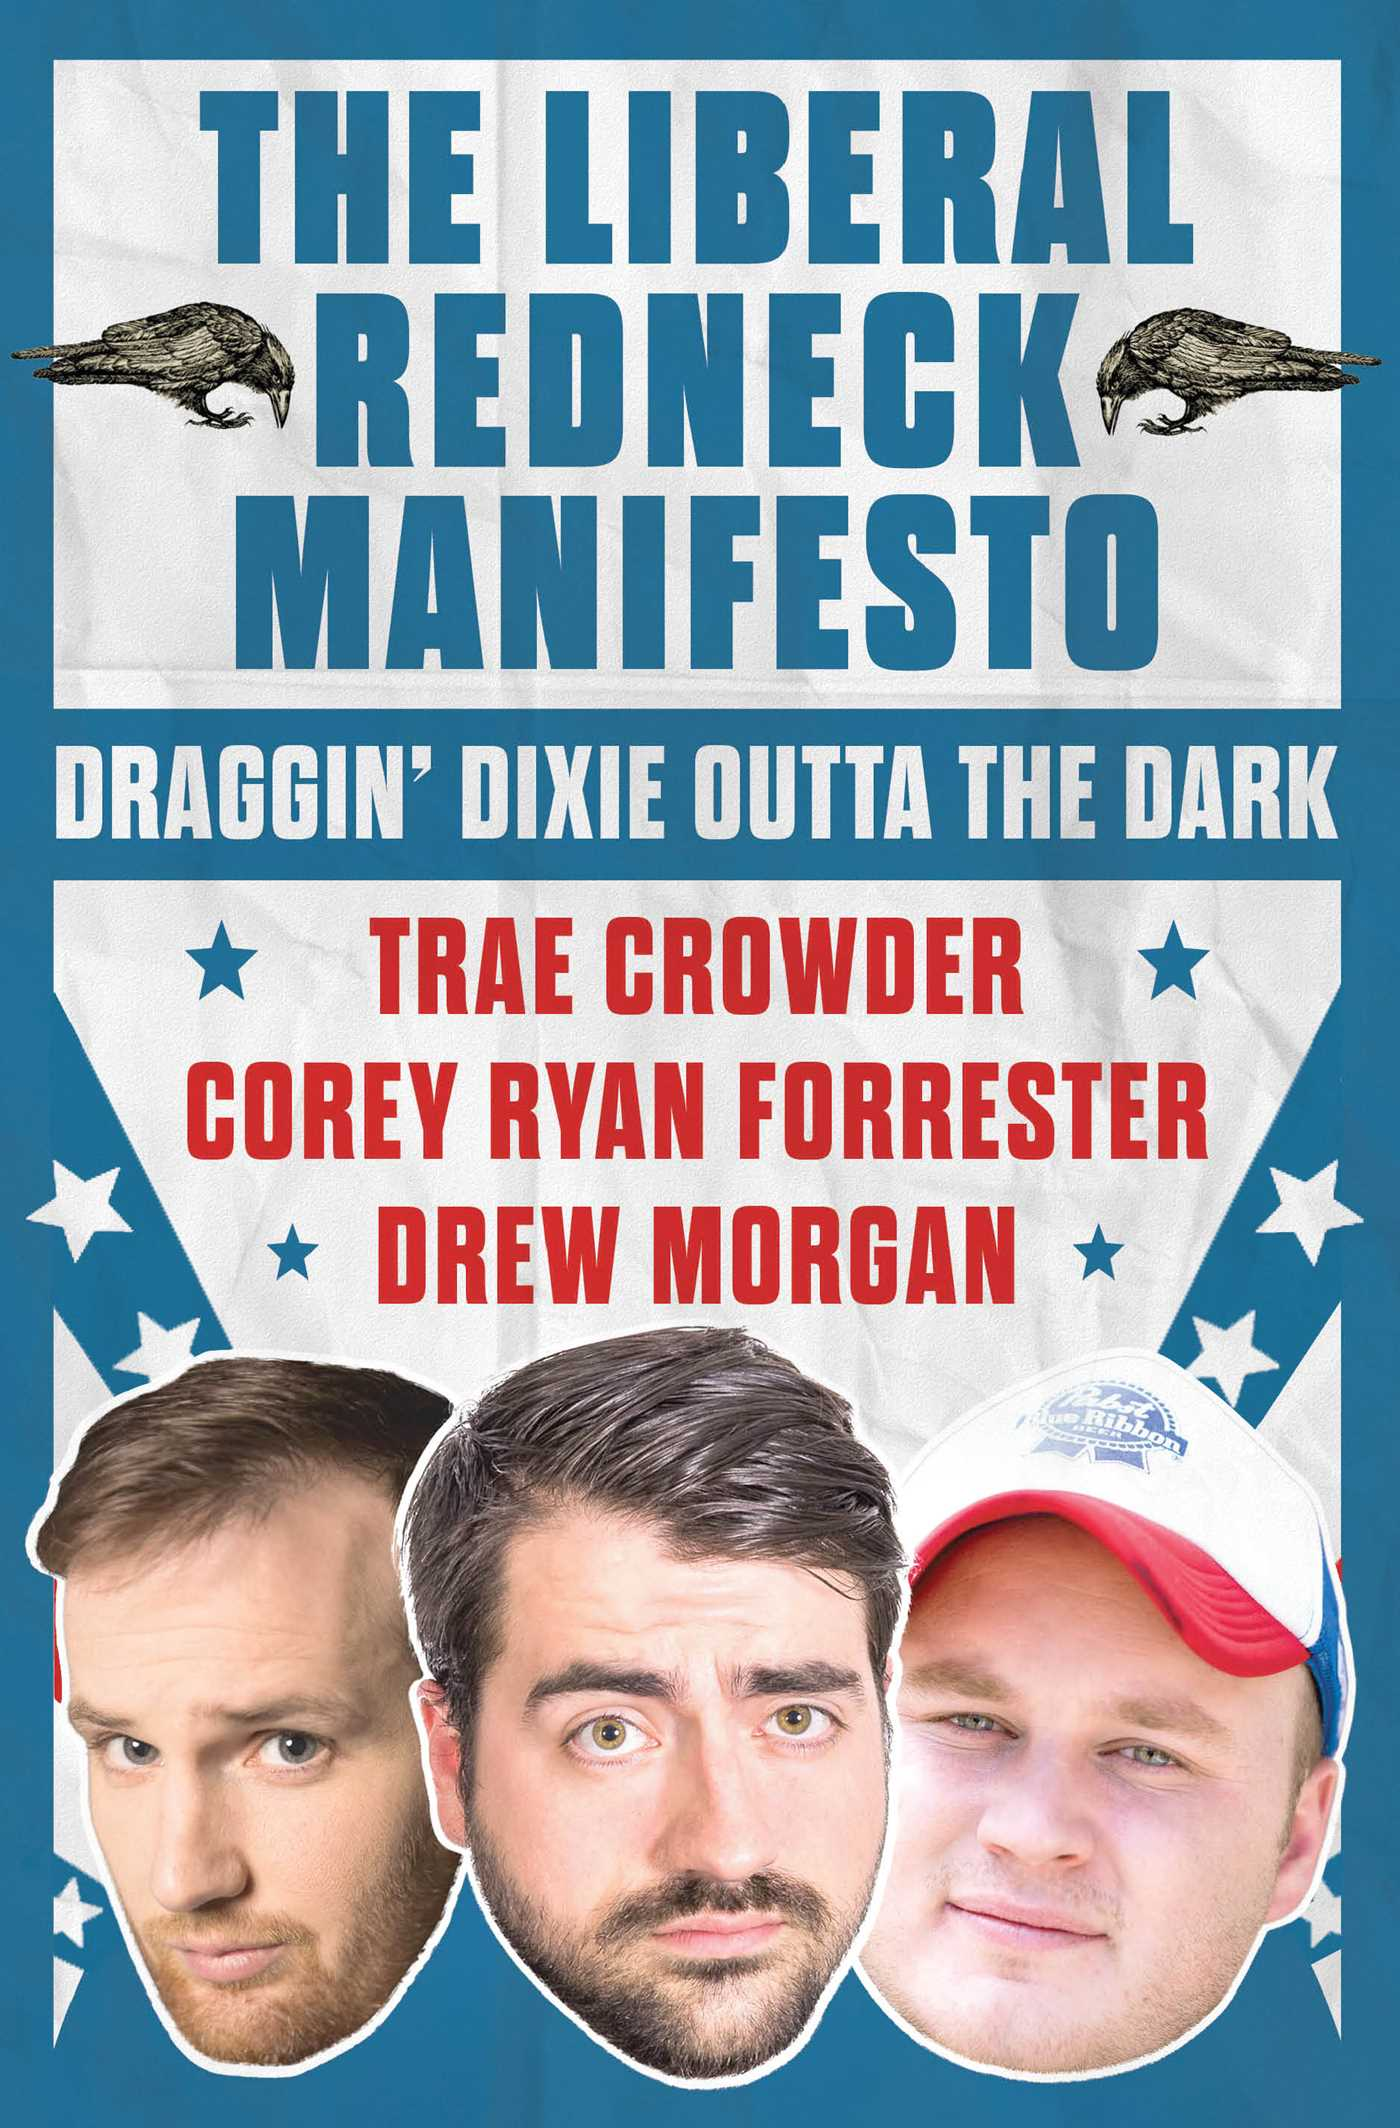 The liberal redneck manifesto 9781501160387 hr